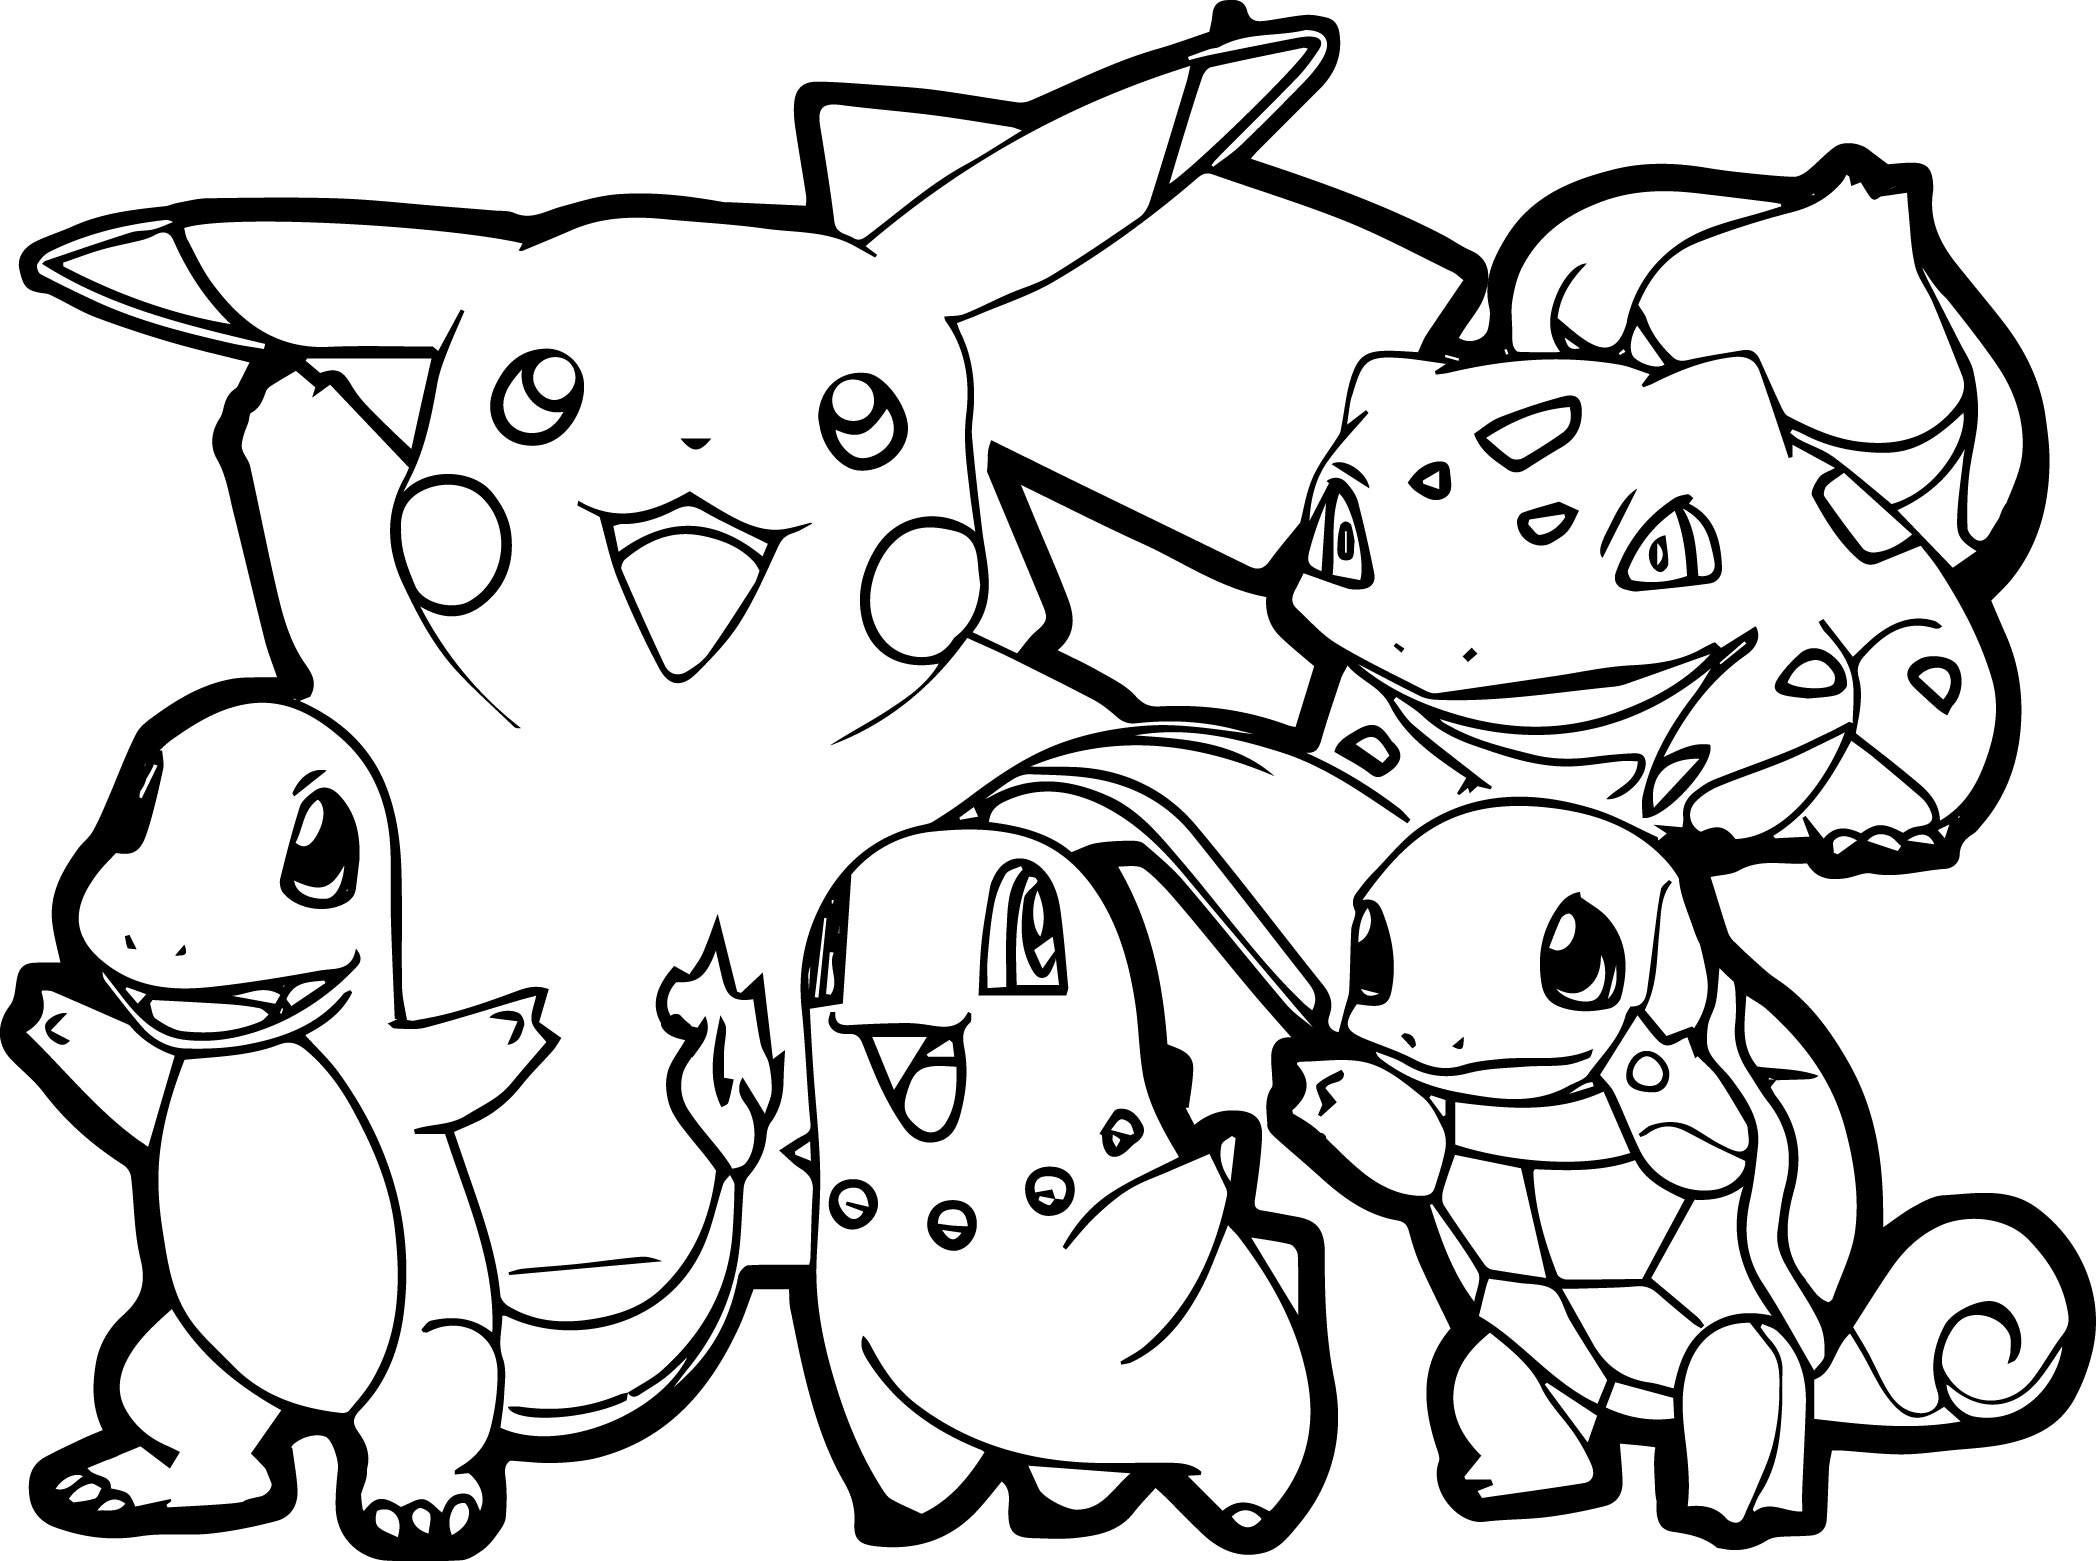 Pokemon Drawing Games at GetDrawings | Free download